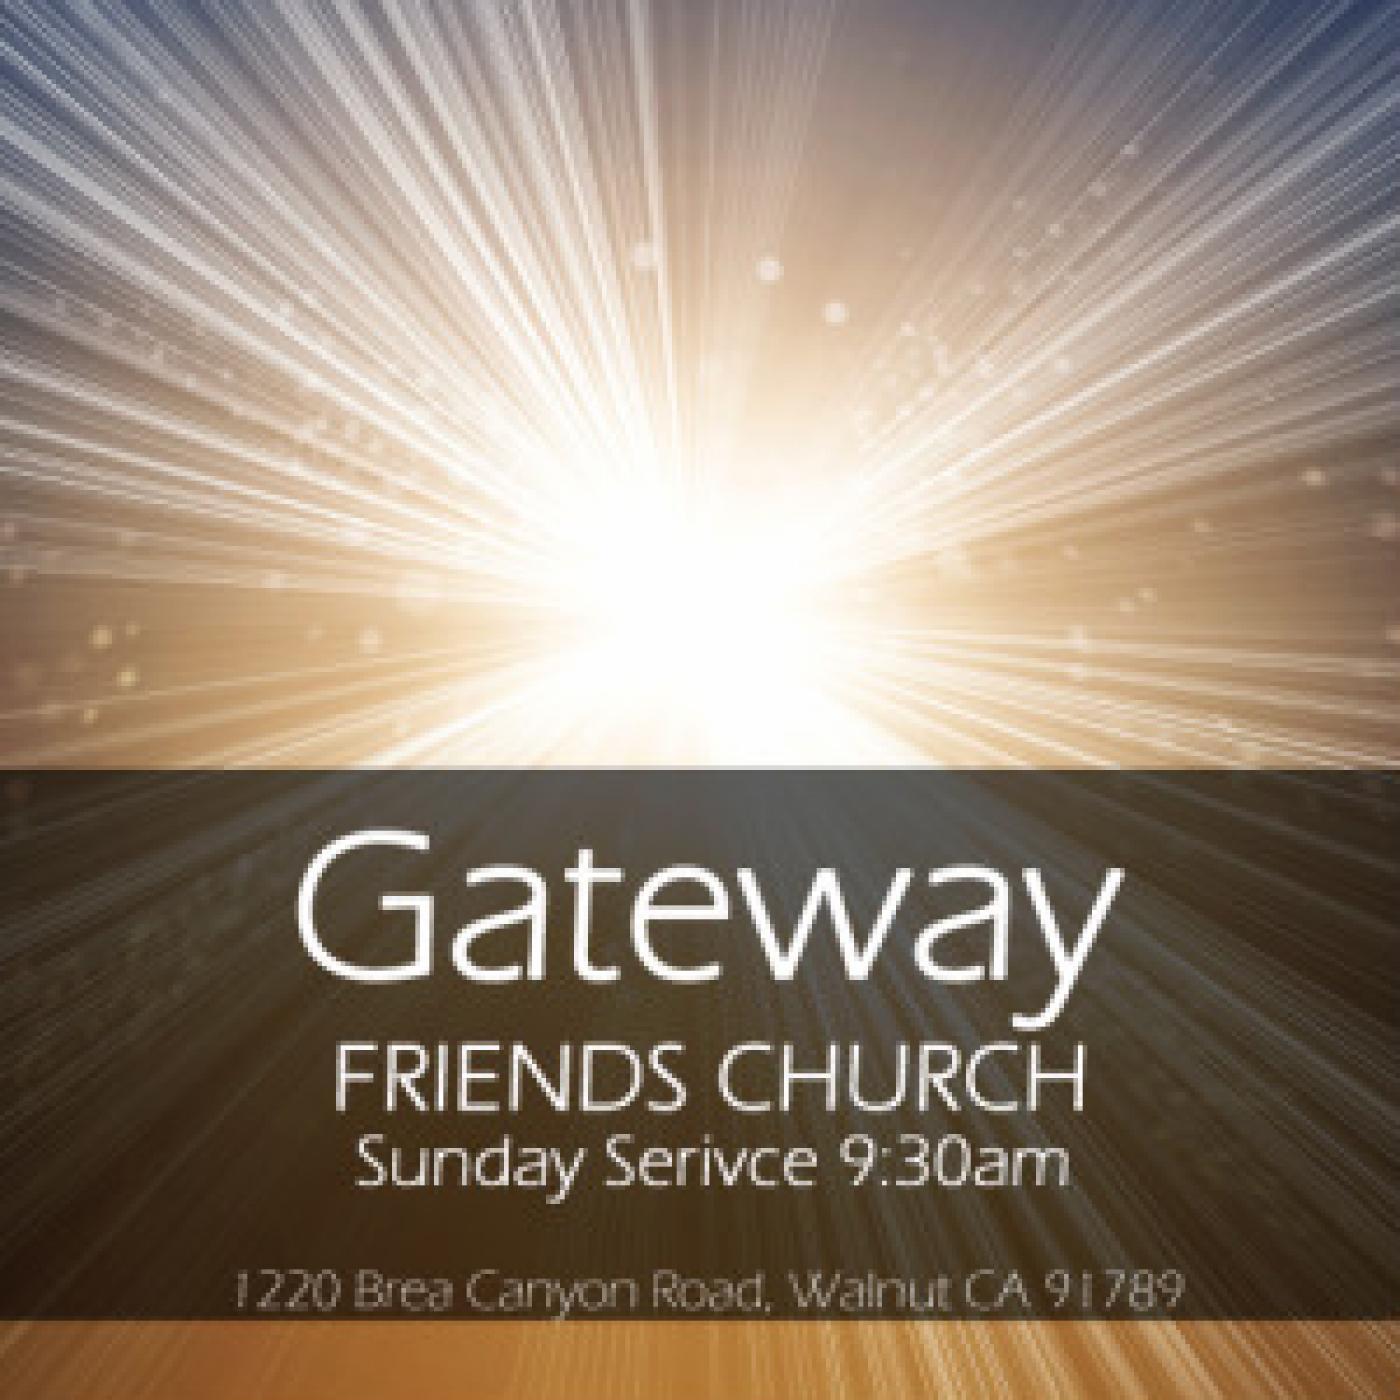 Gateway Friends Church